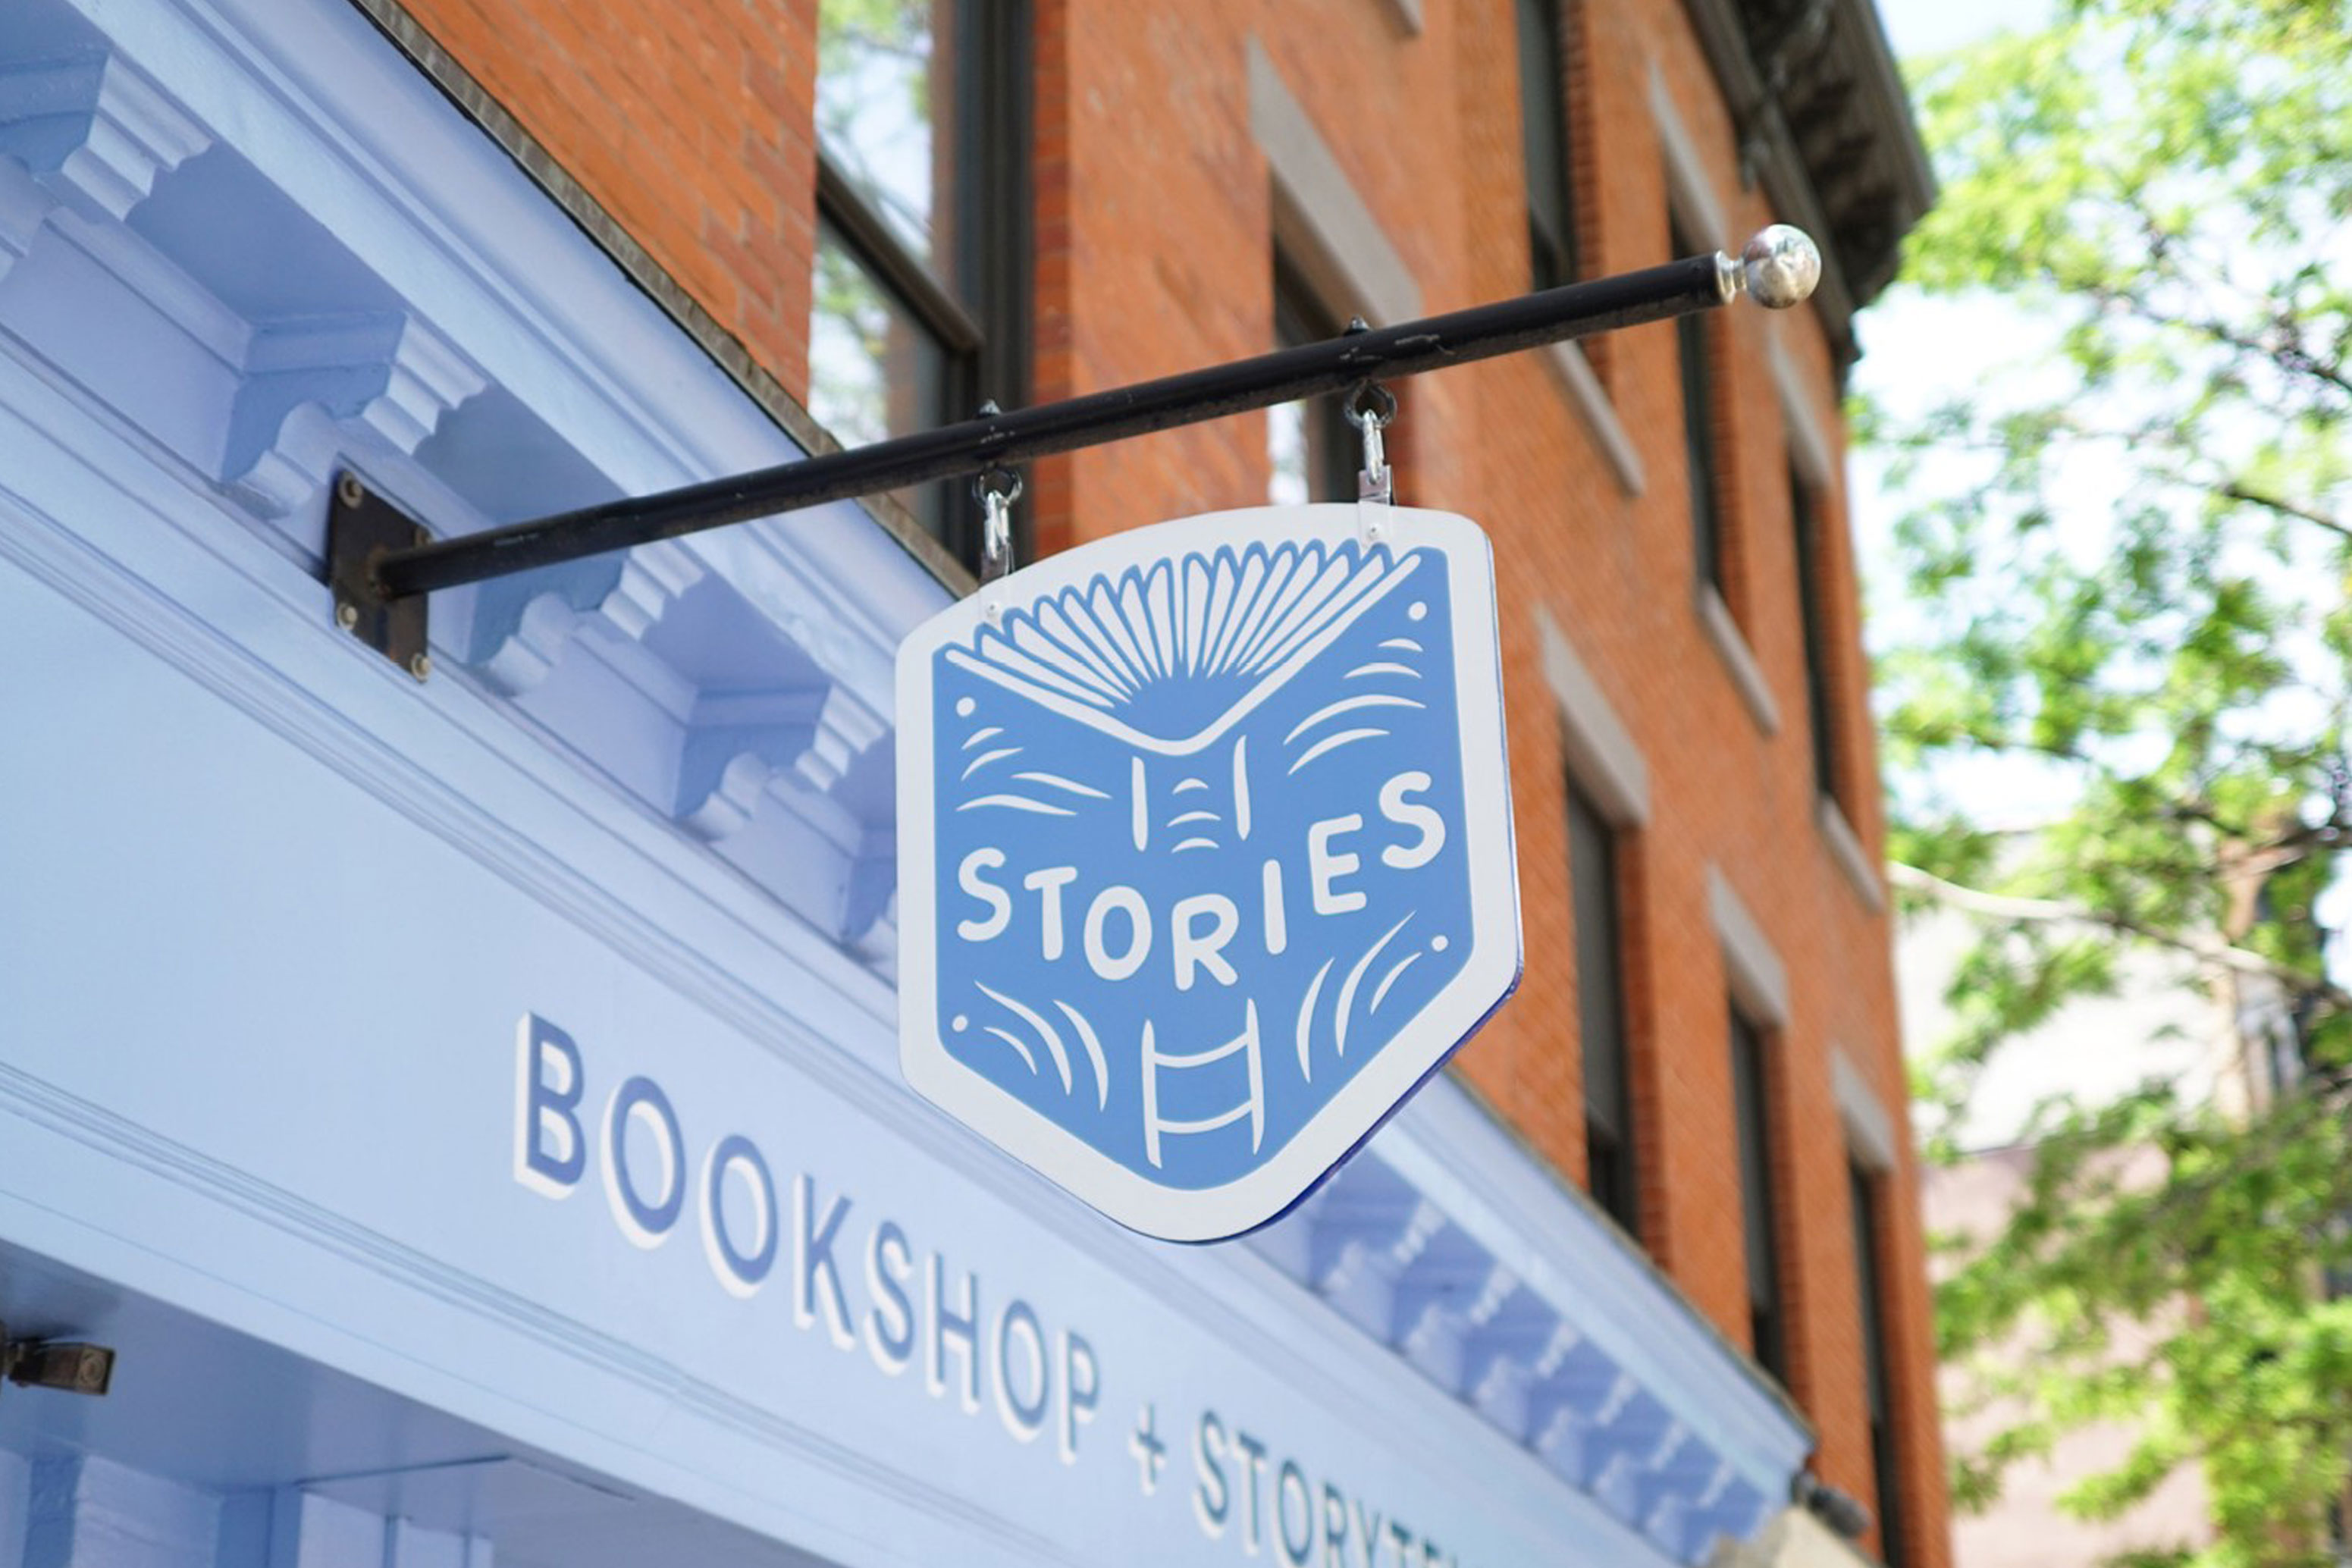 Stories Bookstore Exterior Sign